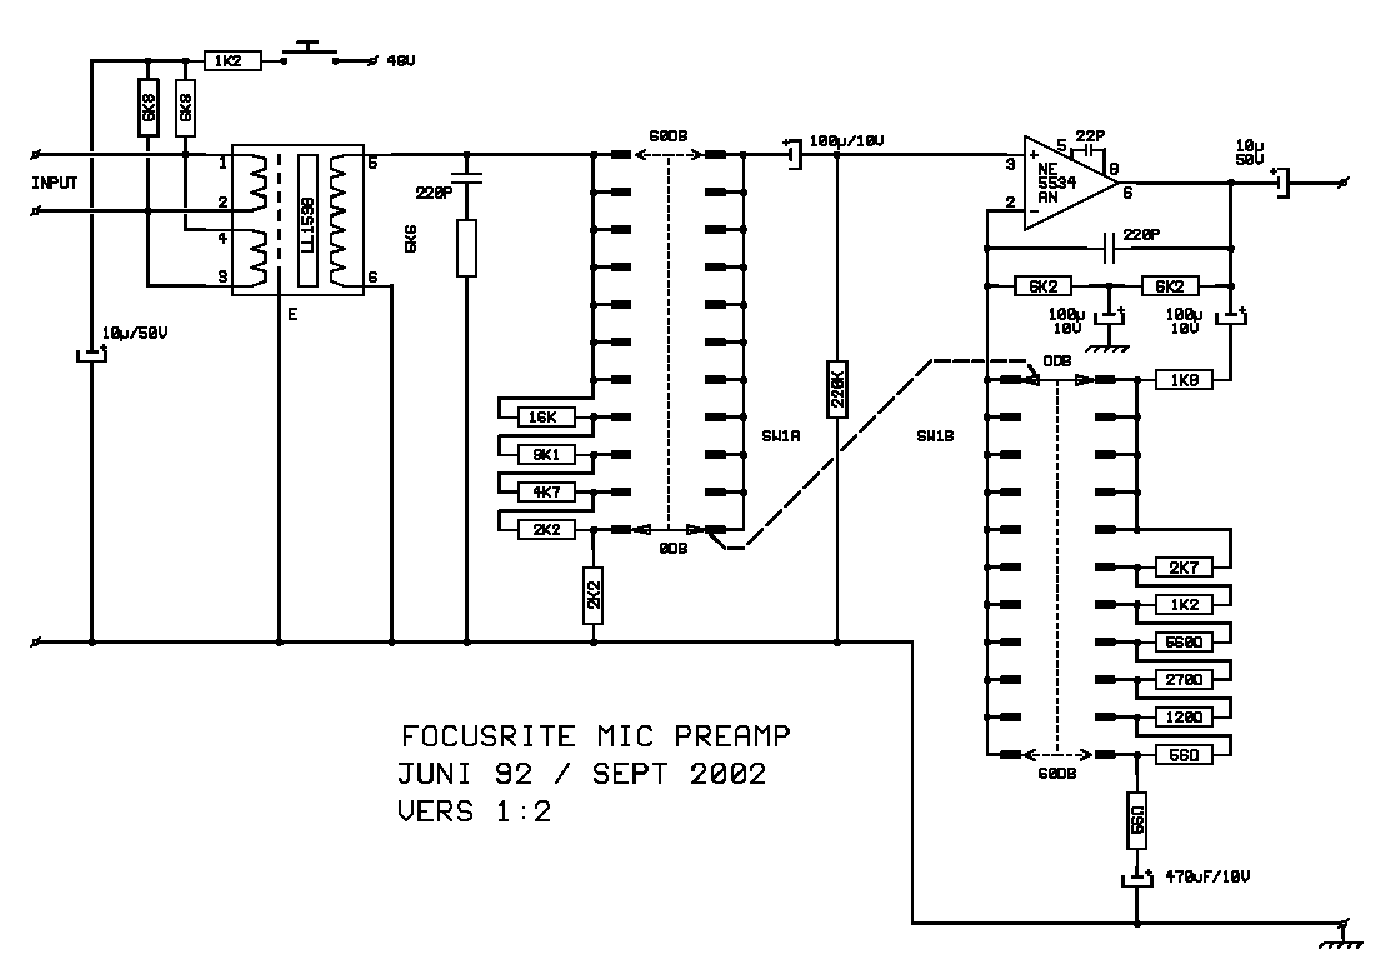 Focusrite Isa Sch Pdf on Ford F Transmission Repair Manual Wiring Diagram Enthusiast Diagrams